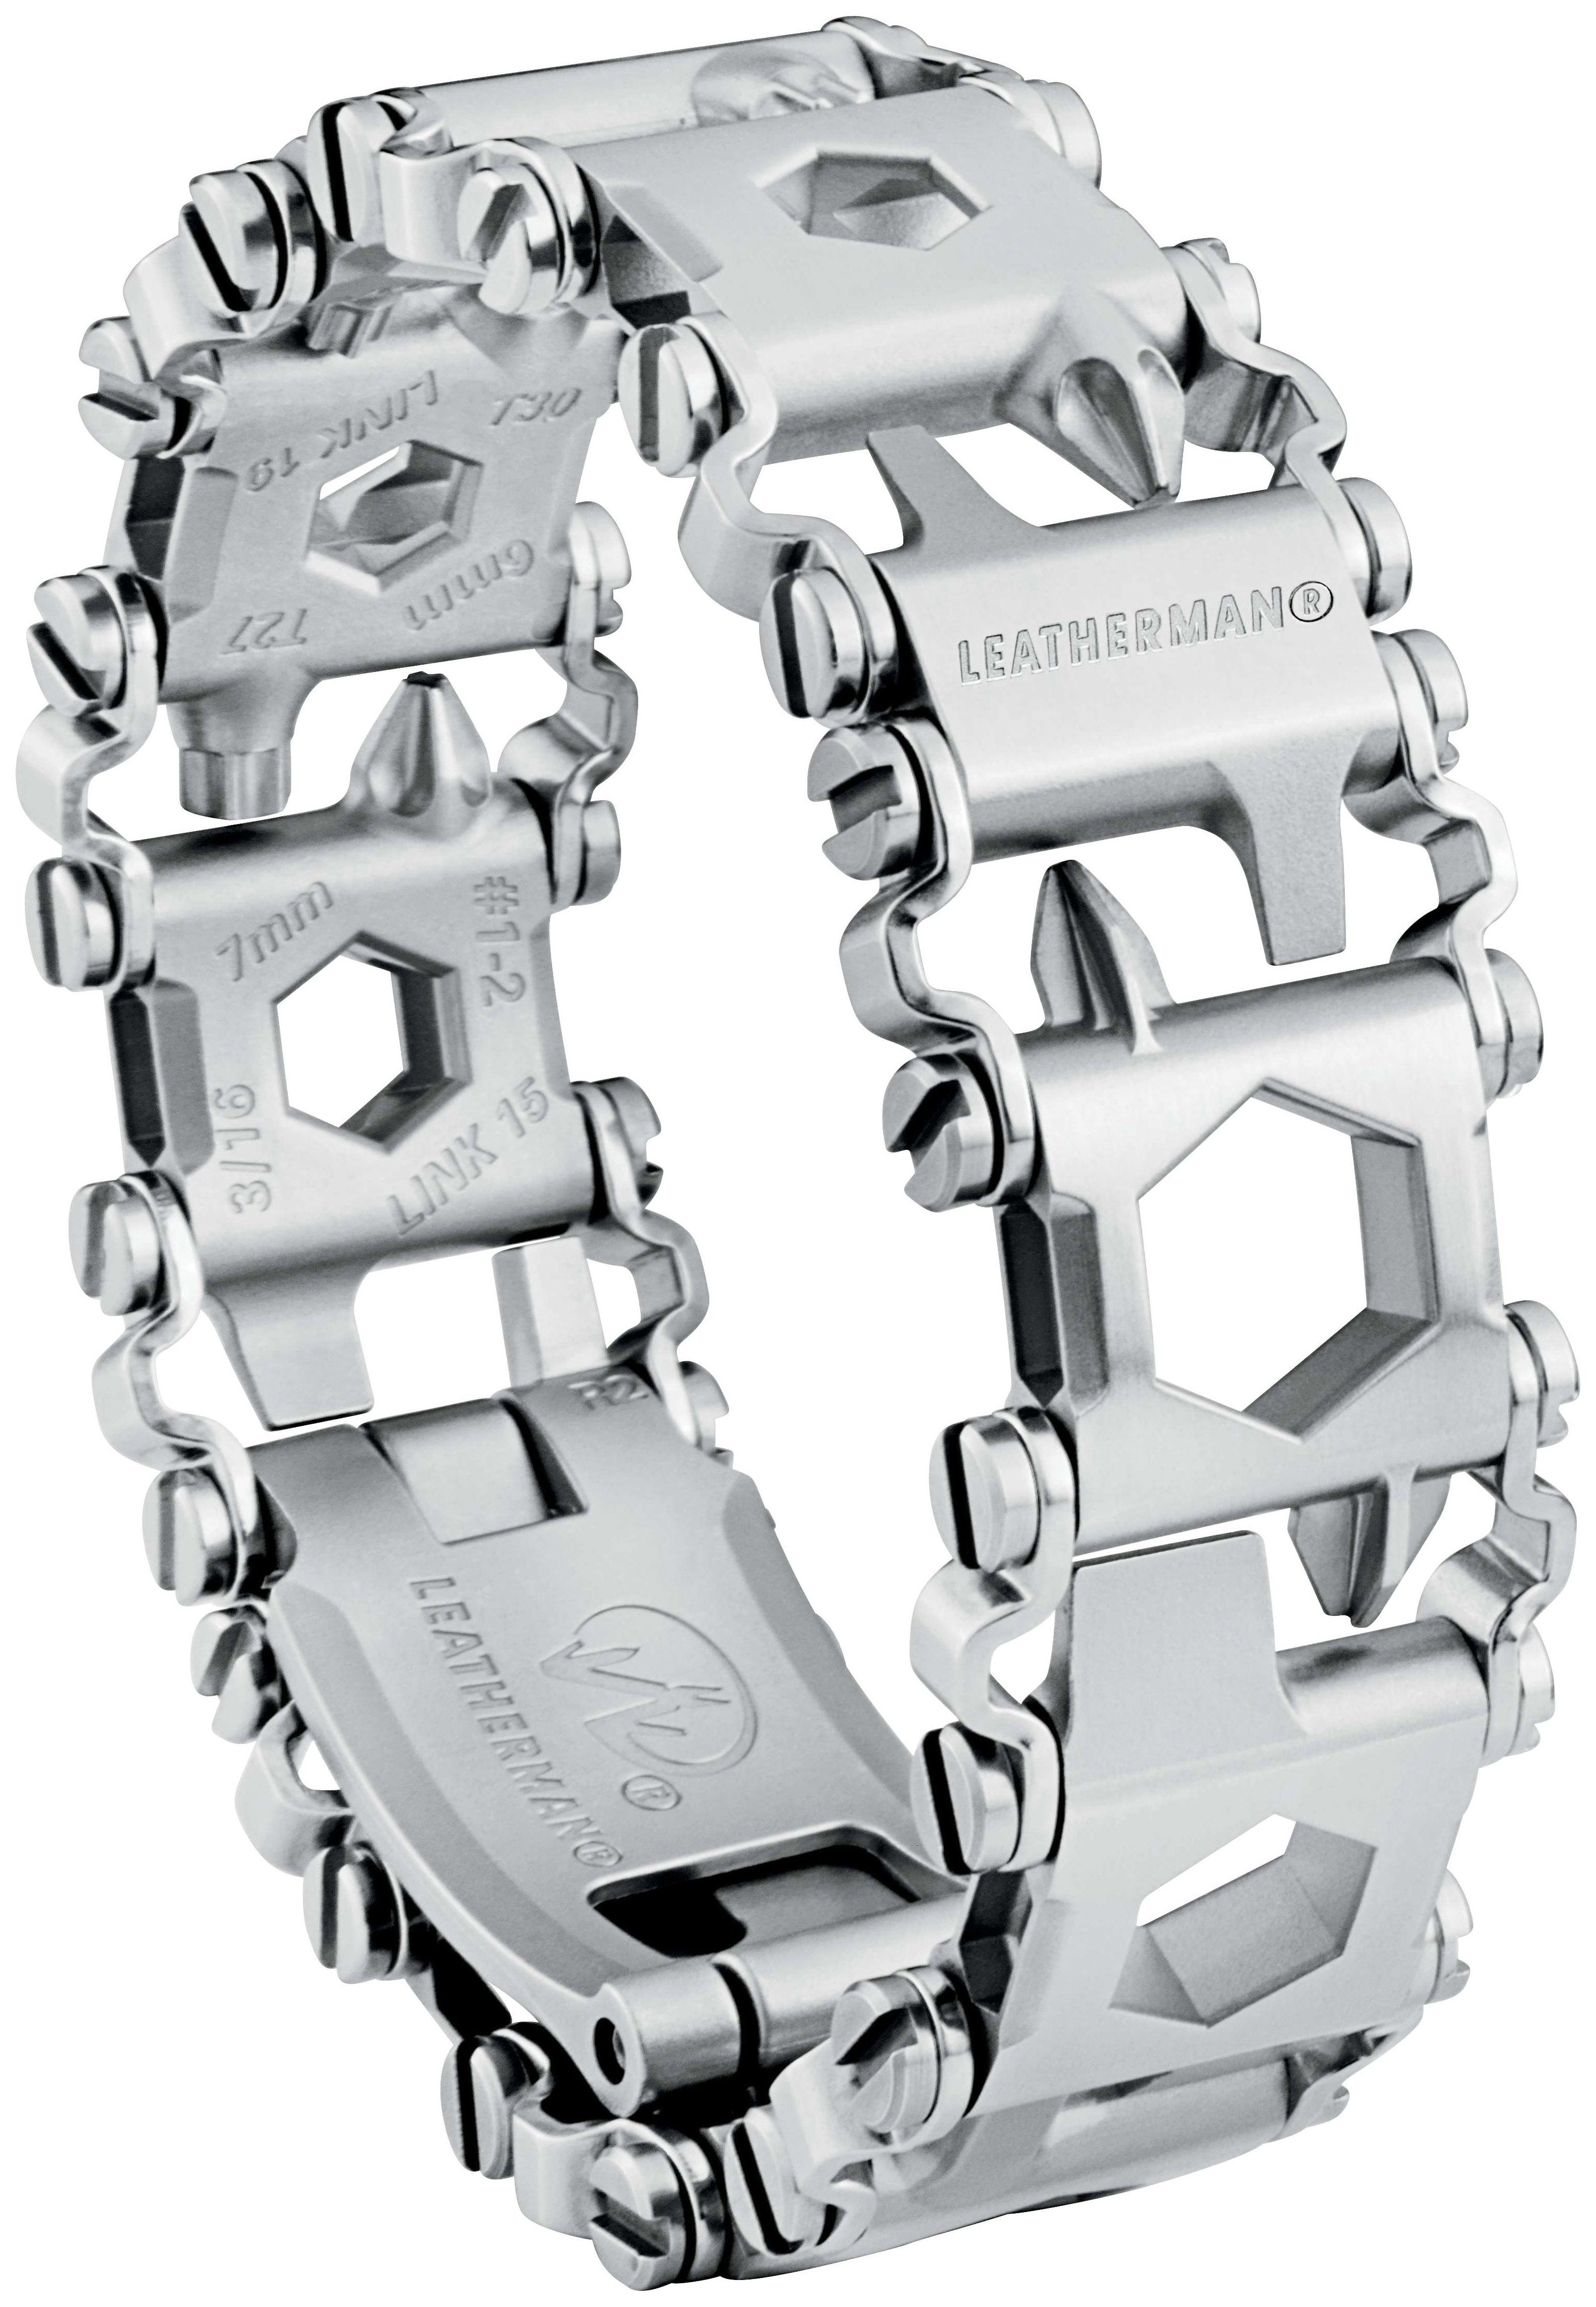 Браслет-мультитул Leatherman Tread 832325 160 мм серебристый, 29 функций